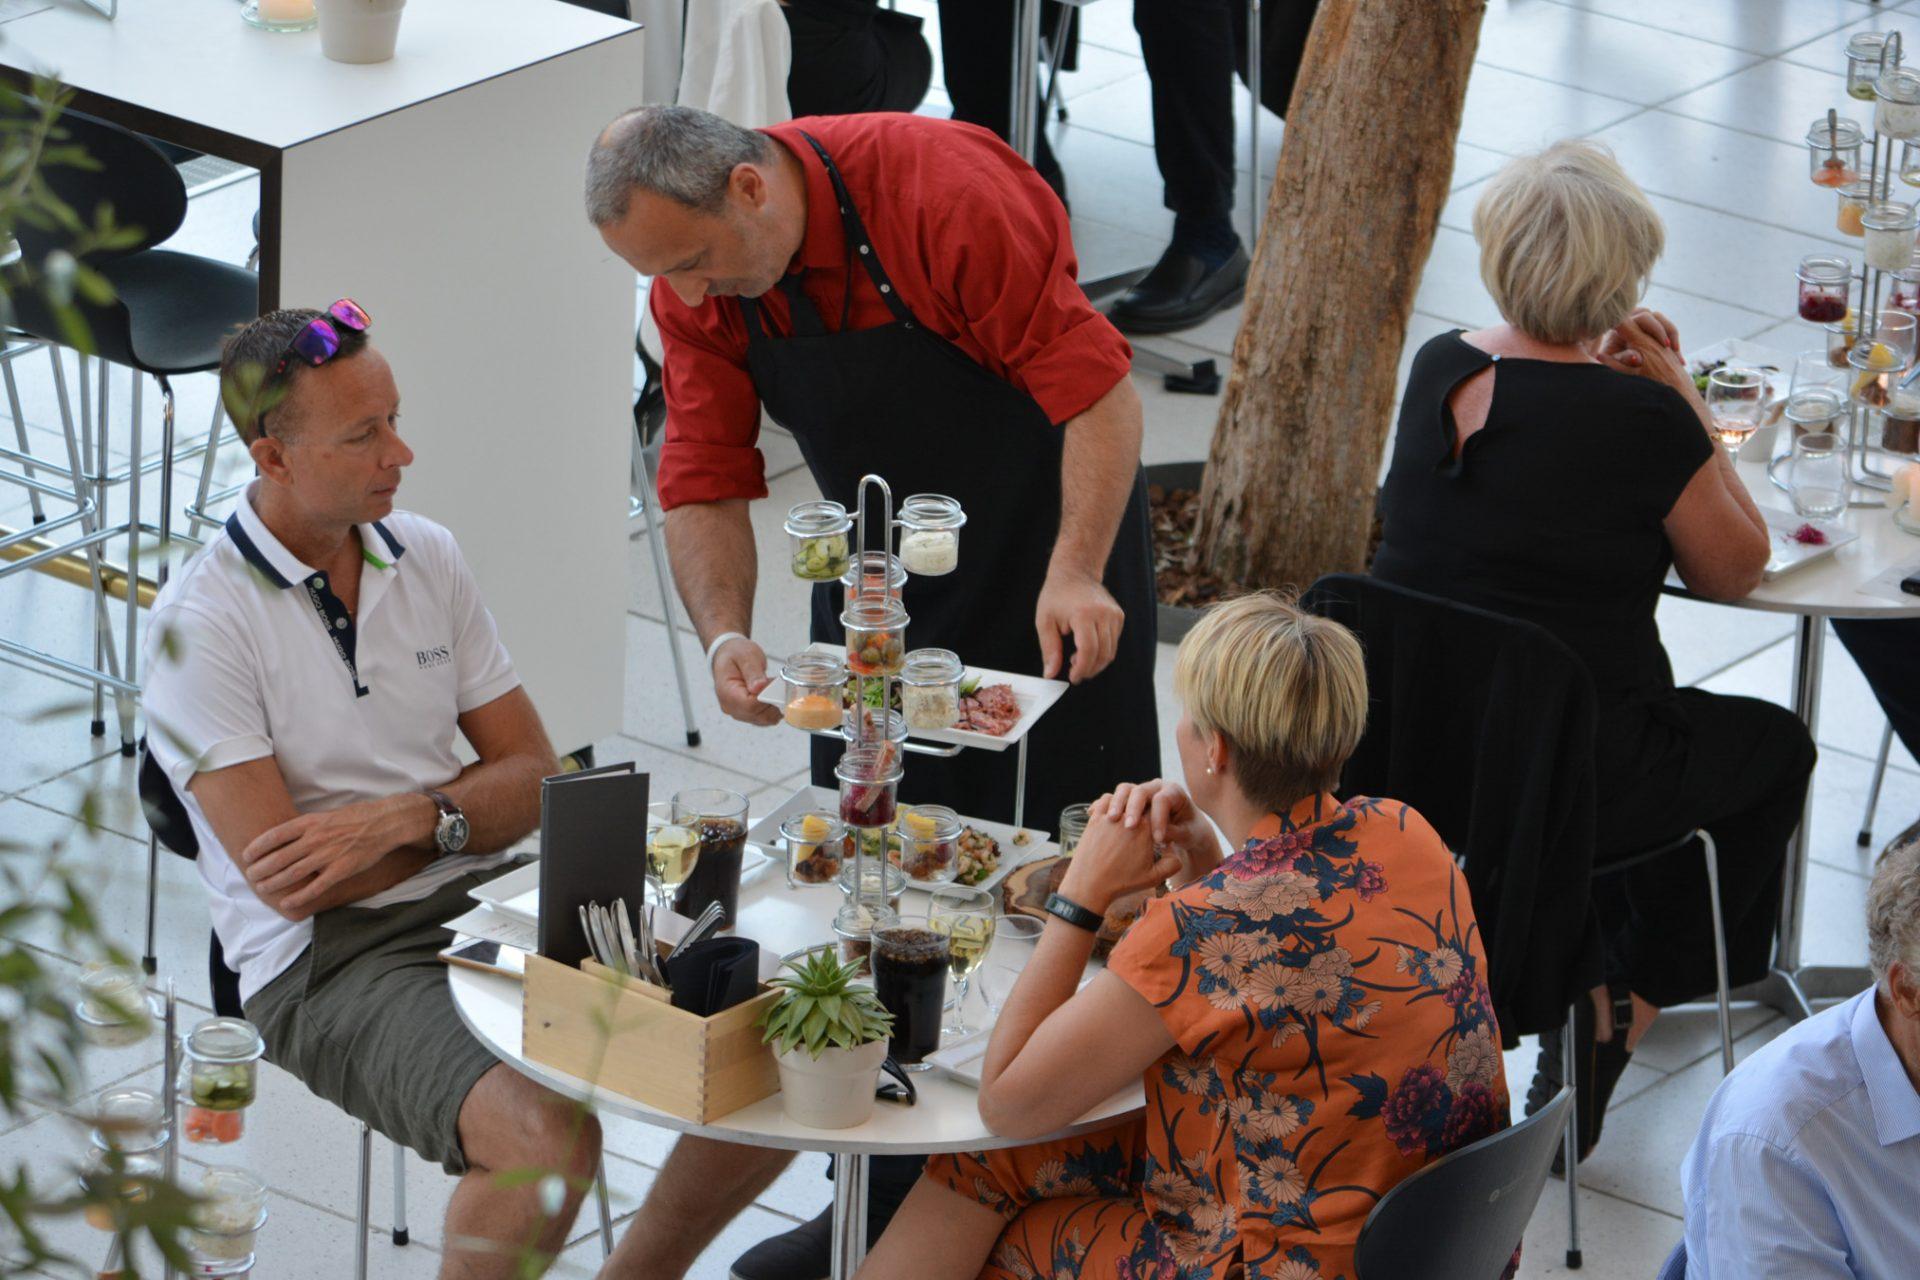 Café johan r: Musikhusets café fylder rundt